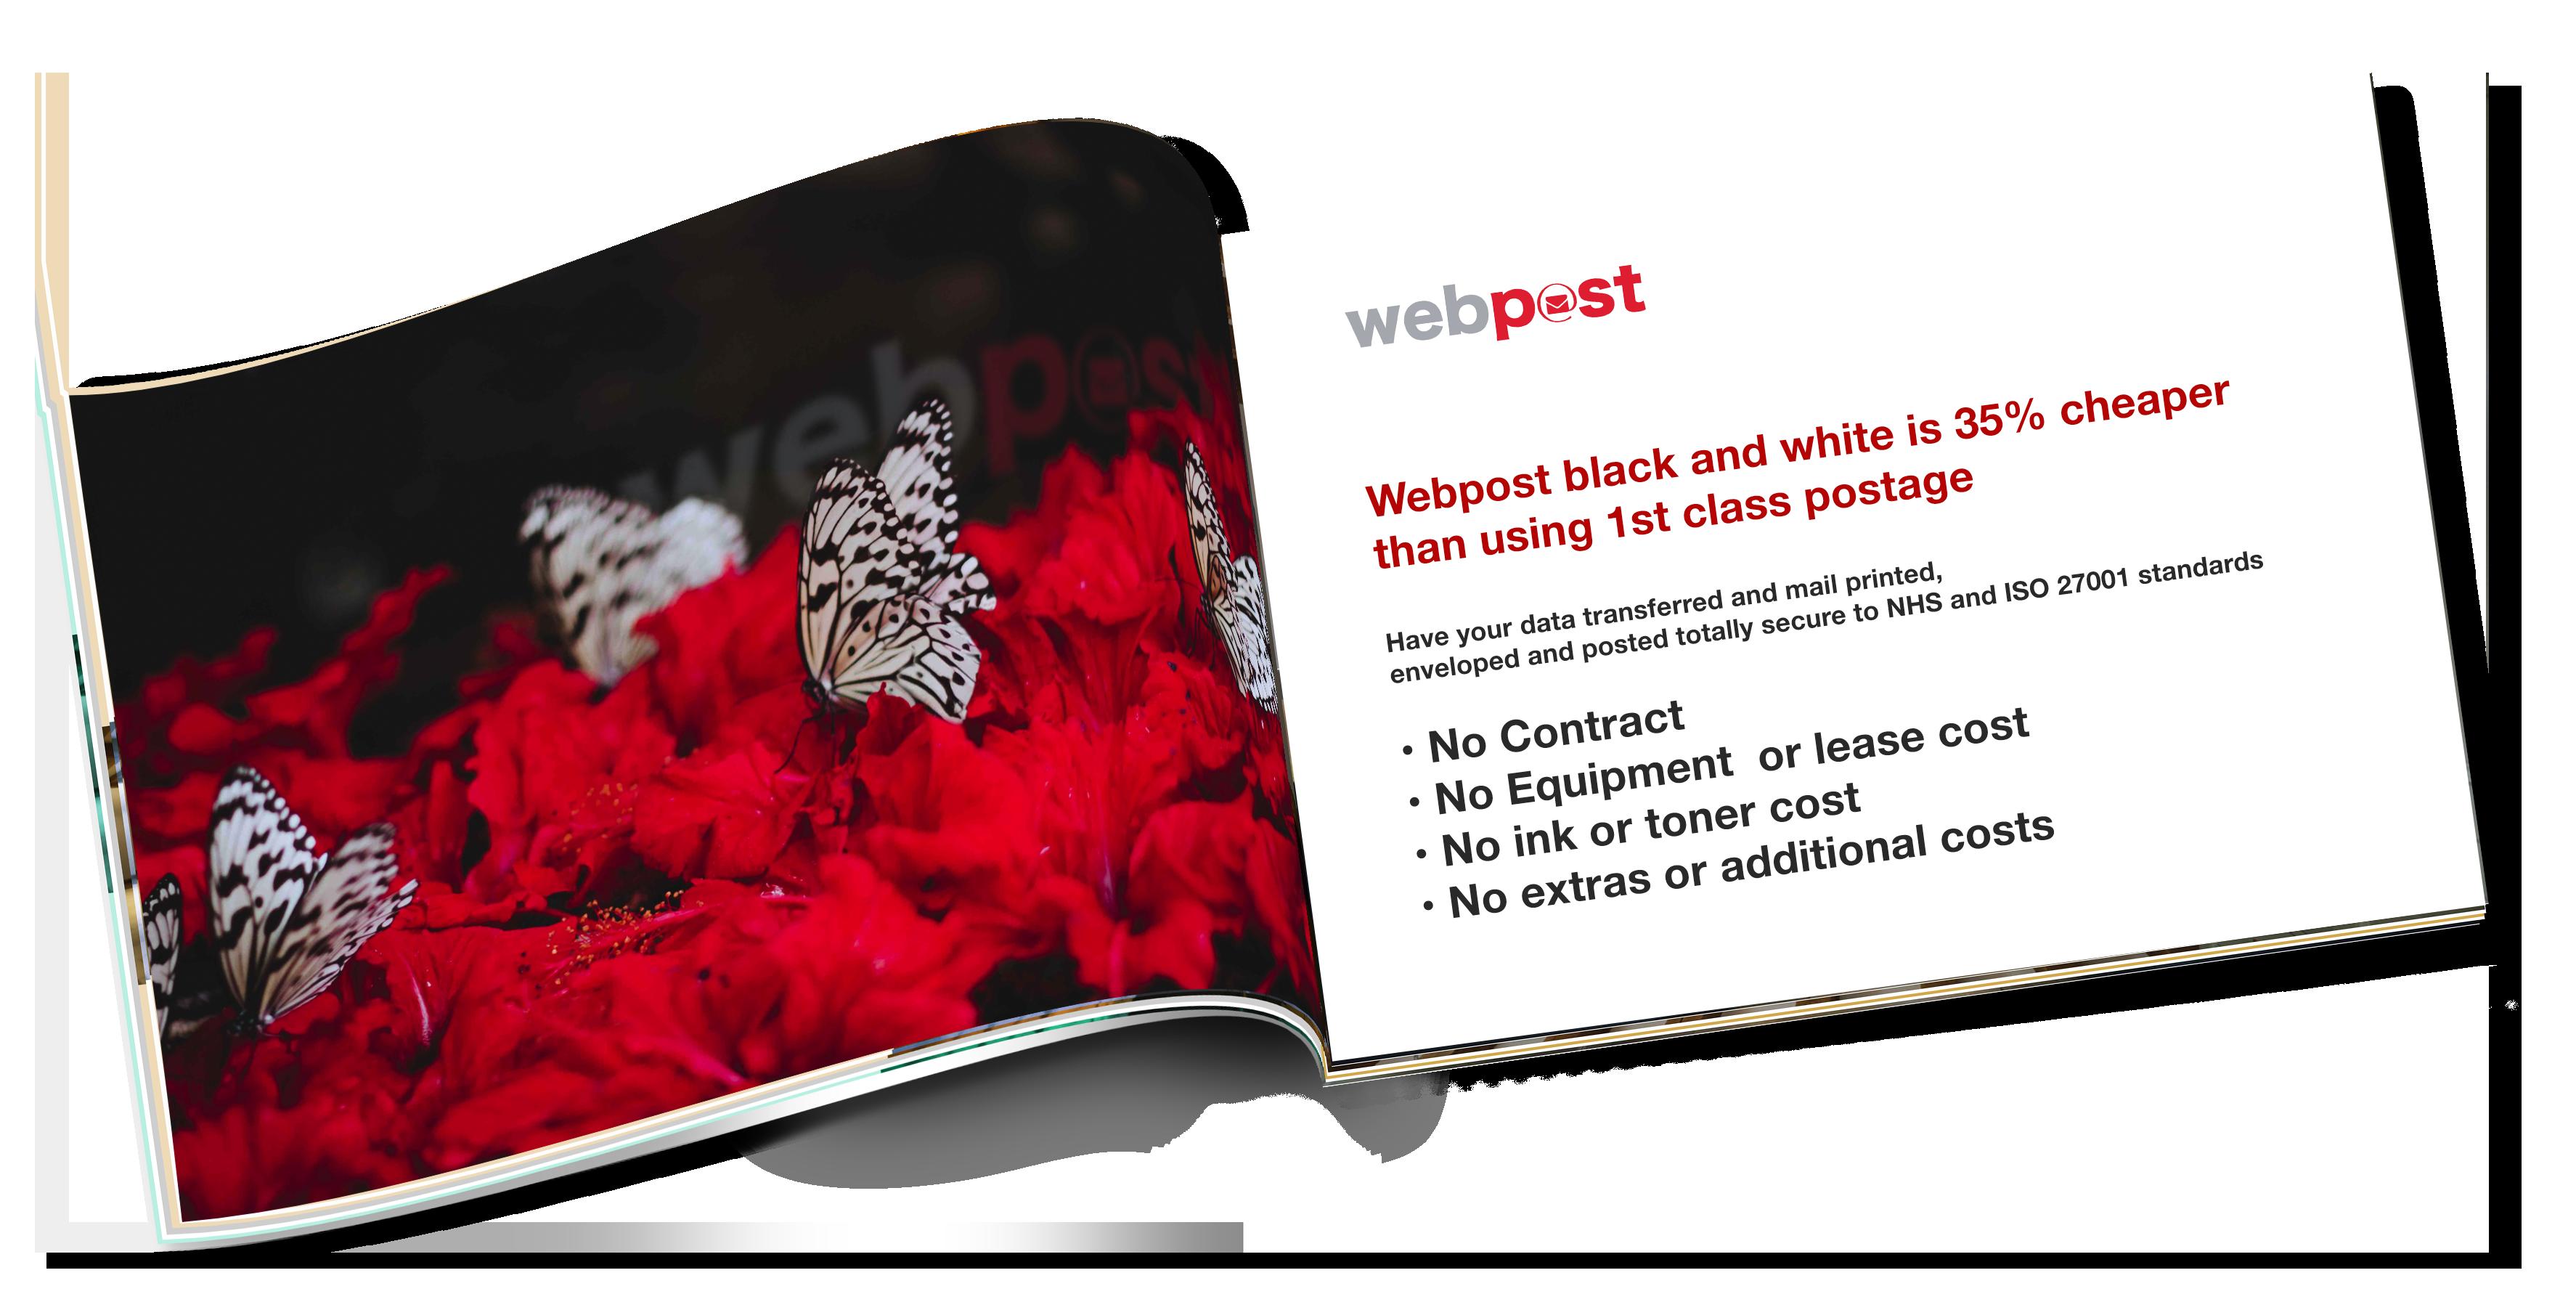 Webpost Hybrid Mail NHS